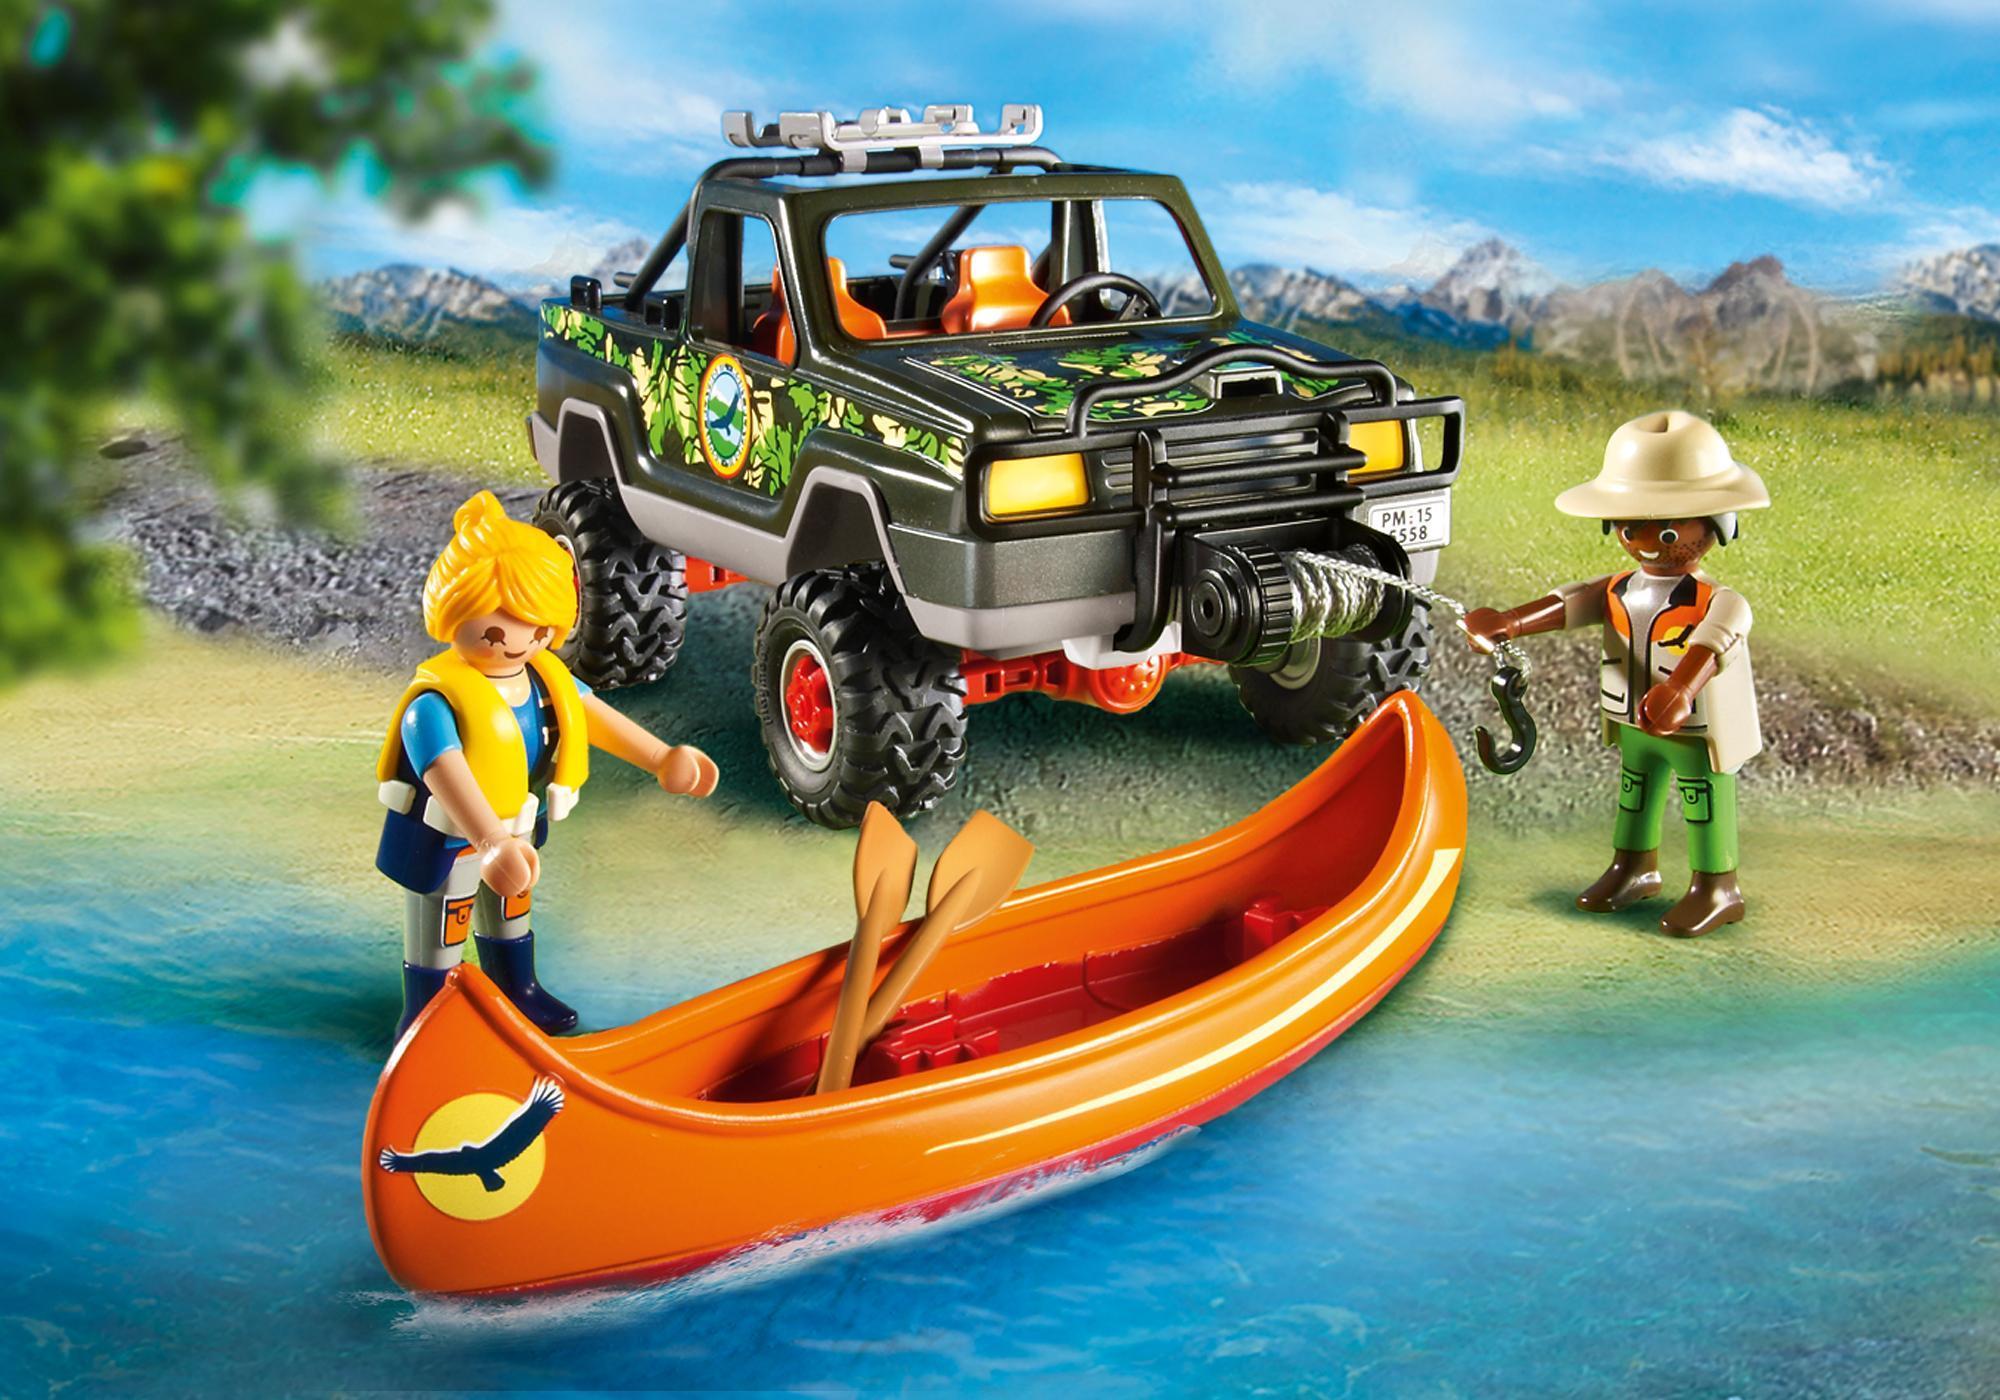 http://media.playmobil.com/i/playmobil/5558_product_extra2/Adventure Pickup Truck